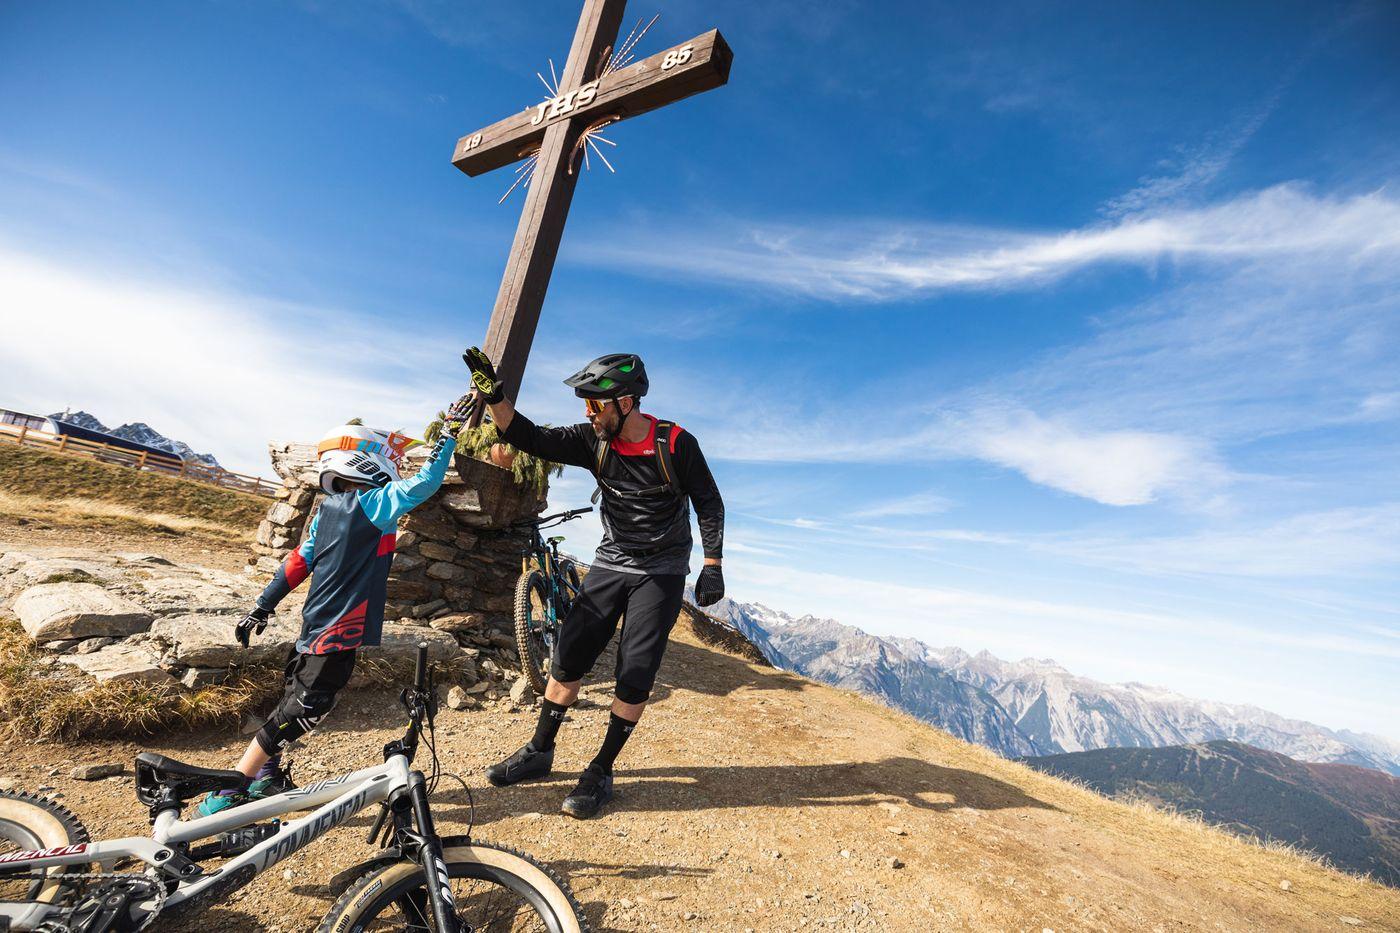 201910-BORNmag-BikeparkSFL-Familyday-Print-BAUSE-077